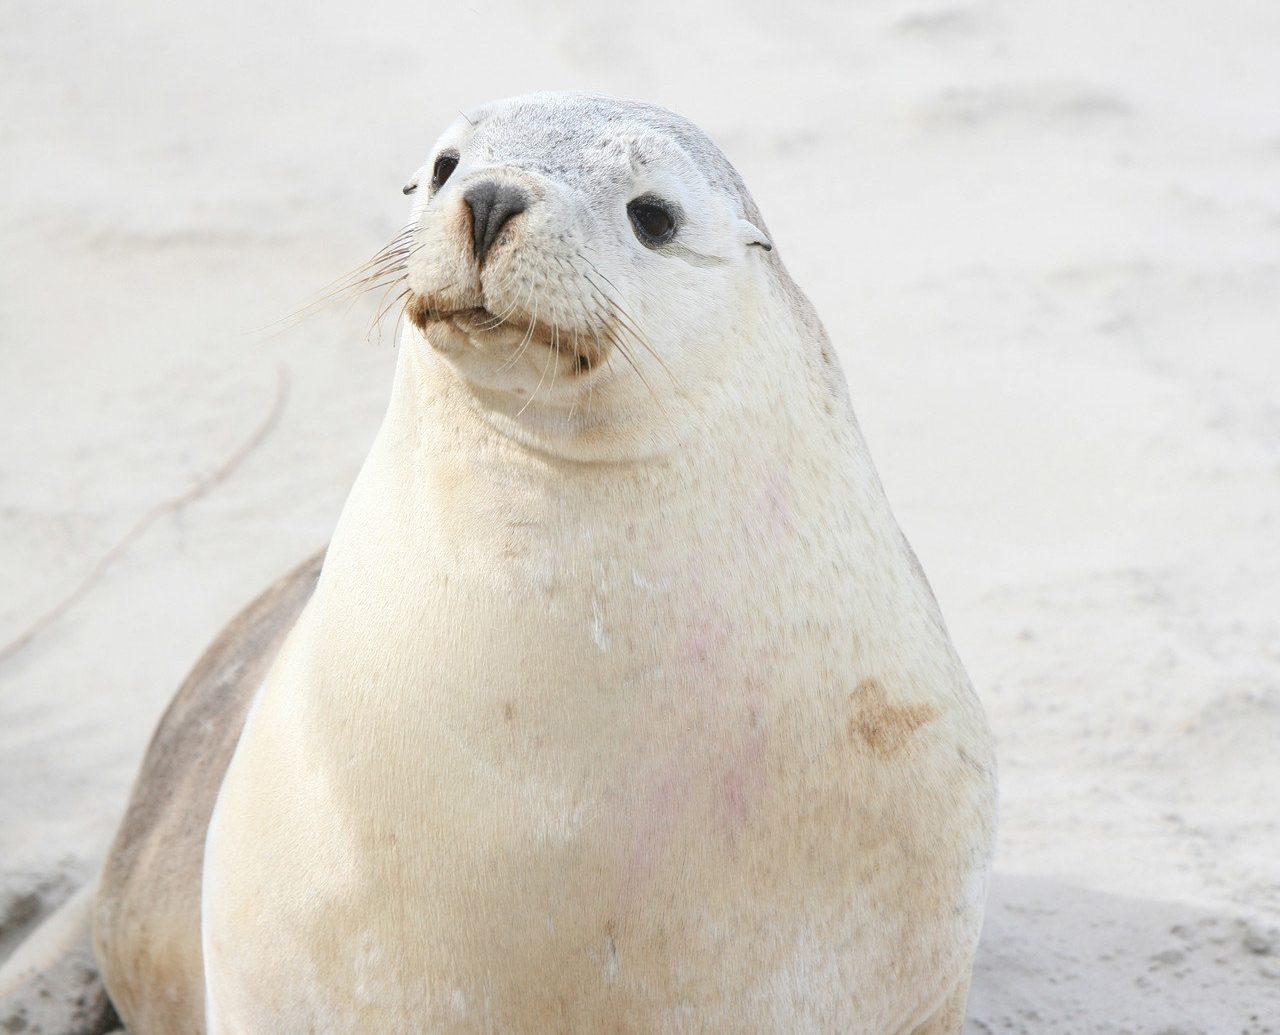 Hotels animal aquatic mammal seal mammal harbor seal ground seals outdoor vertebrate marine mammal fauna Wildlife laying sand sandy